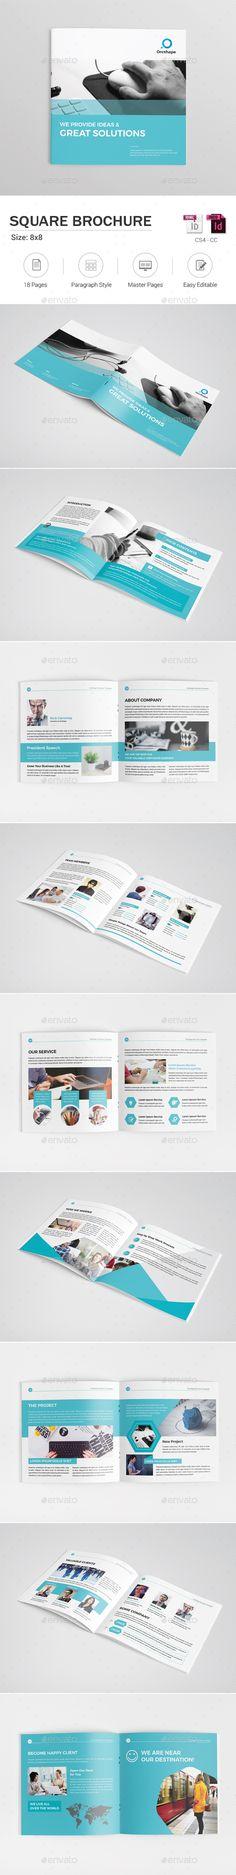 Square Brochure - Corporate Brochures Download here : https://graphicriver.net/item/square-brochure/19453740?s_rank=69&ref=Al-fatih